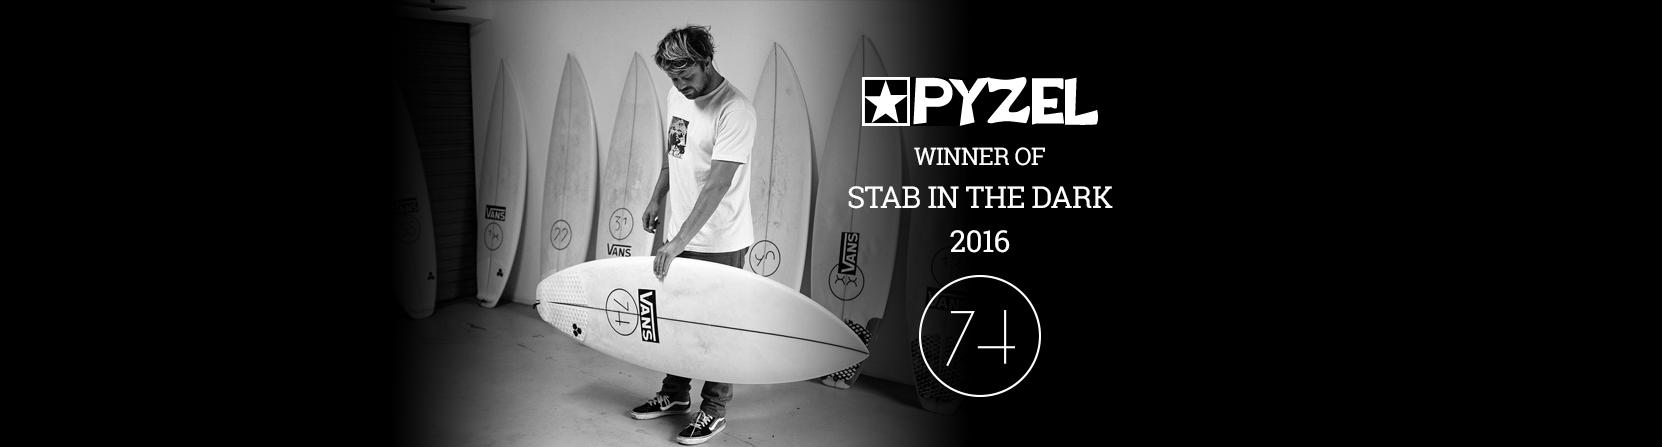 stab-in-the-dark-winner-74-pyzel-surfboards